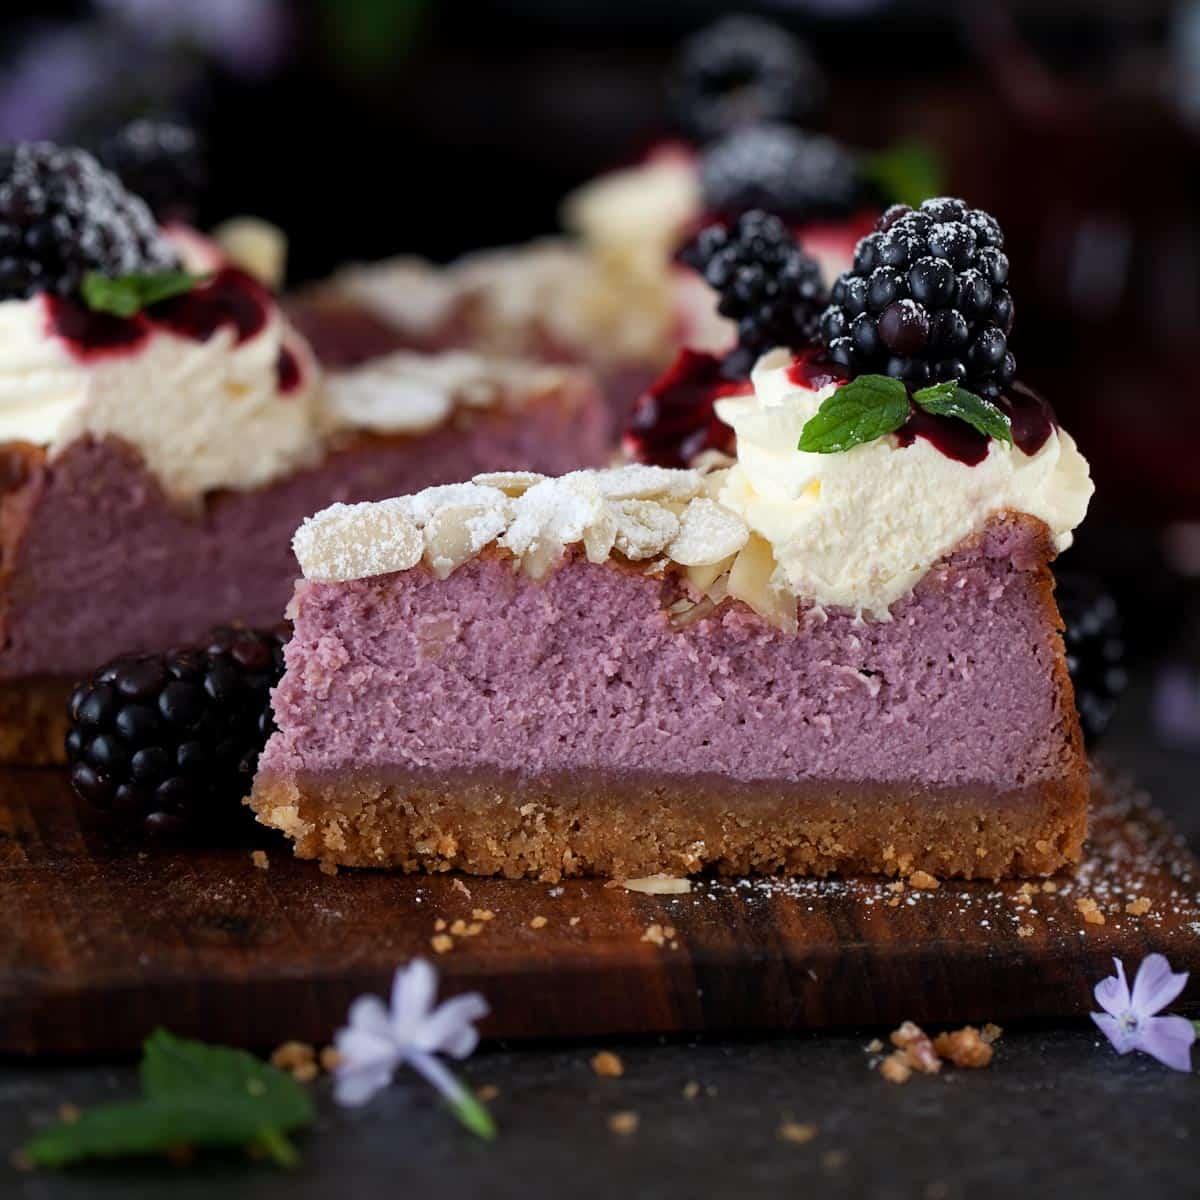 Blackberry Feta Cheesecake